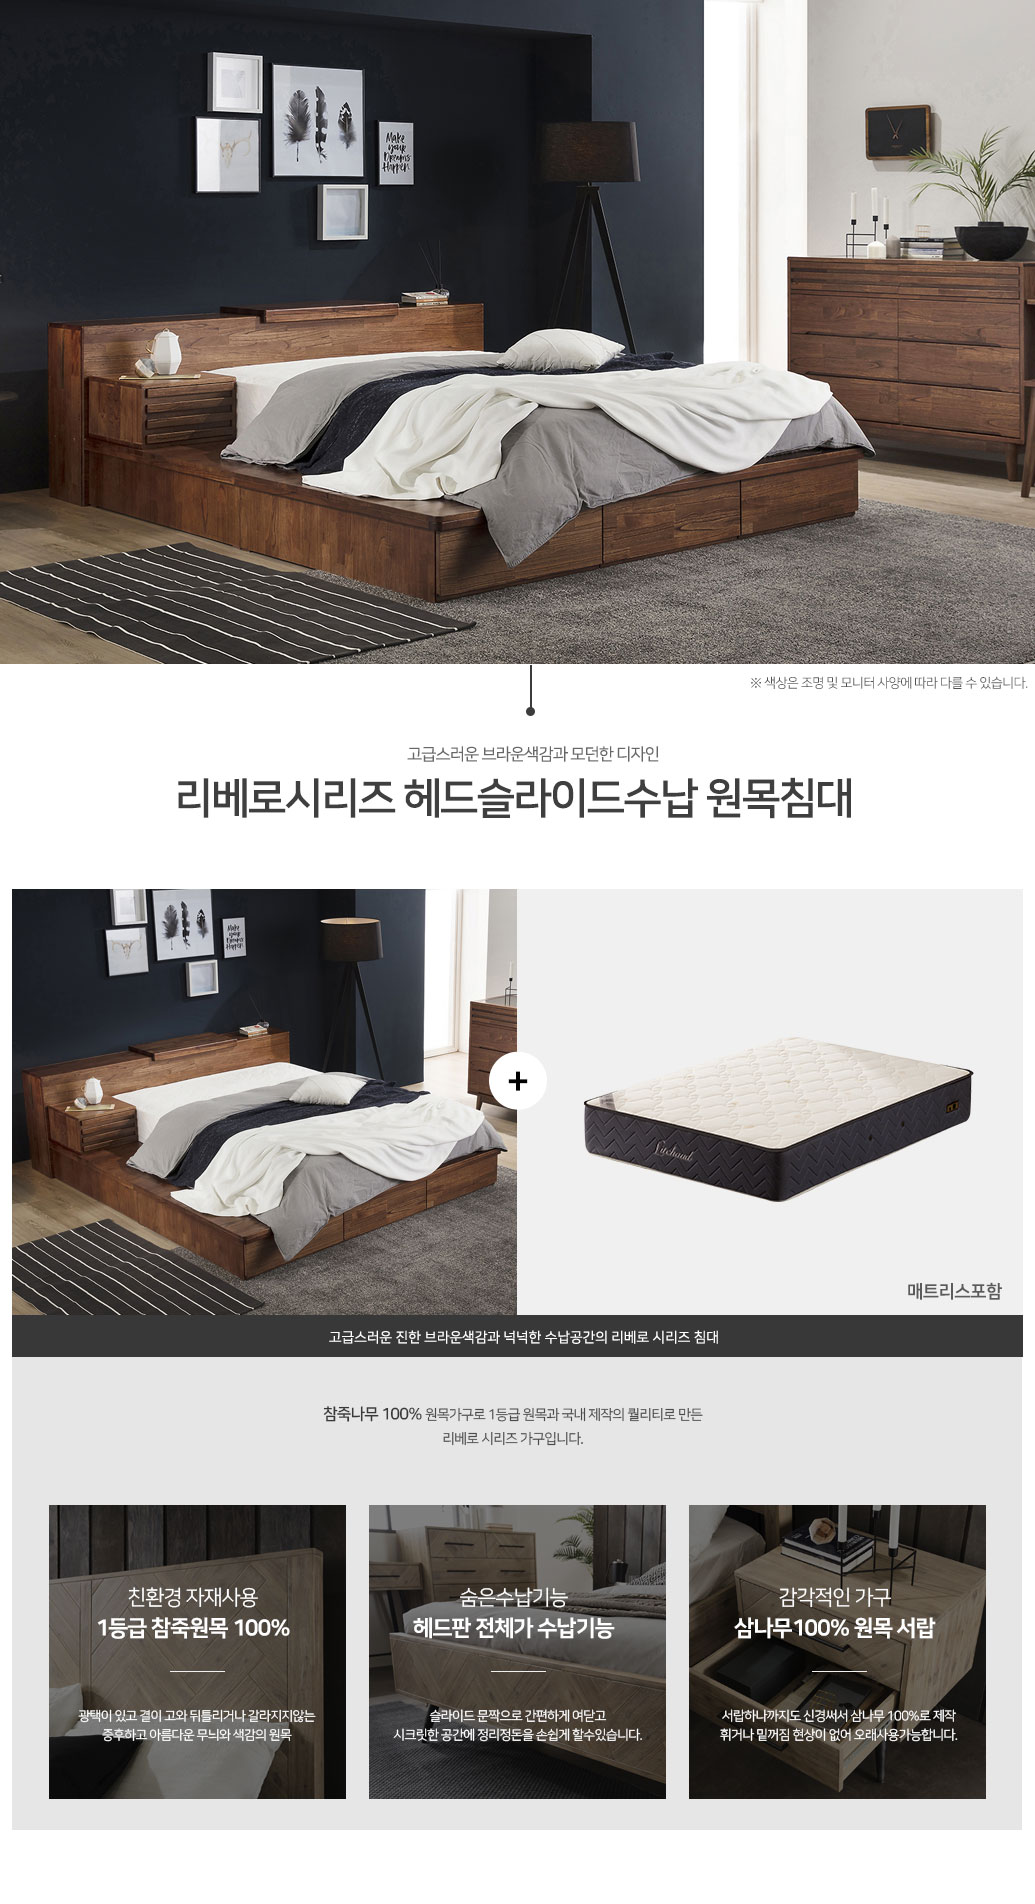 libero_bed_01.jpg